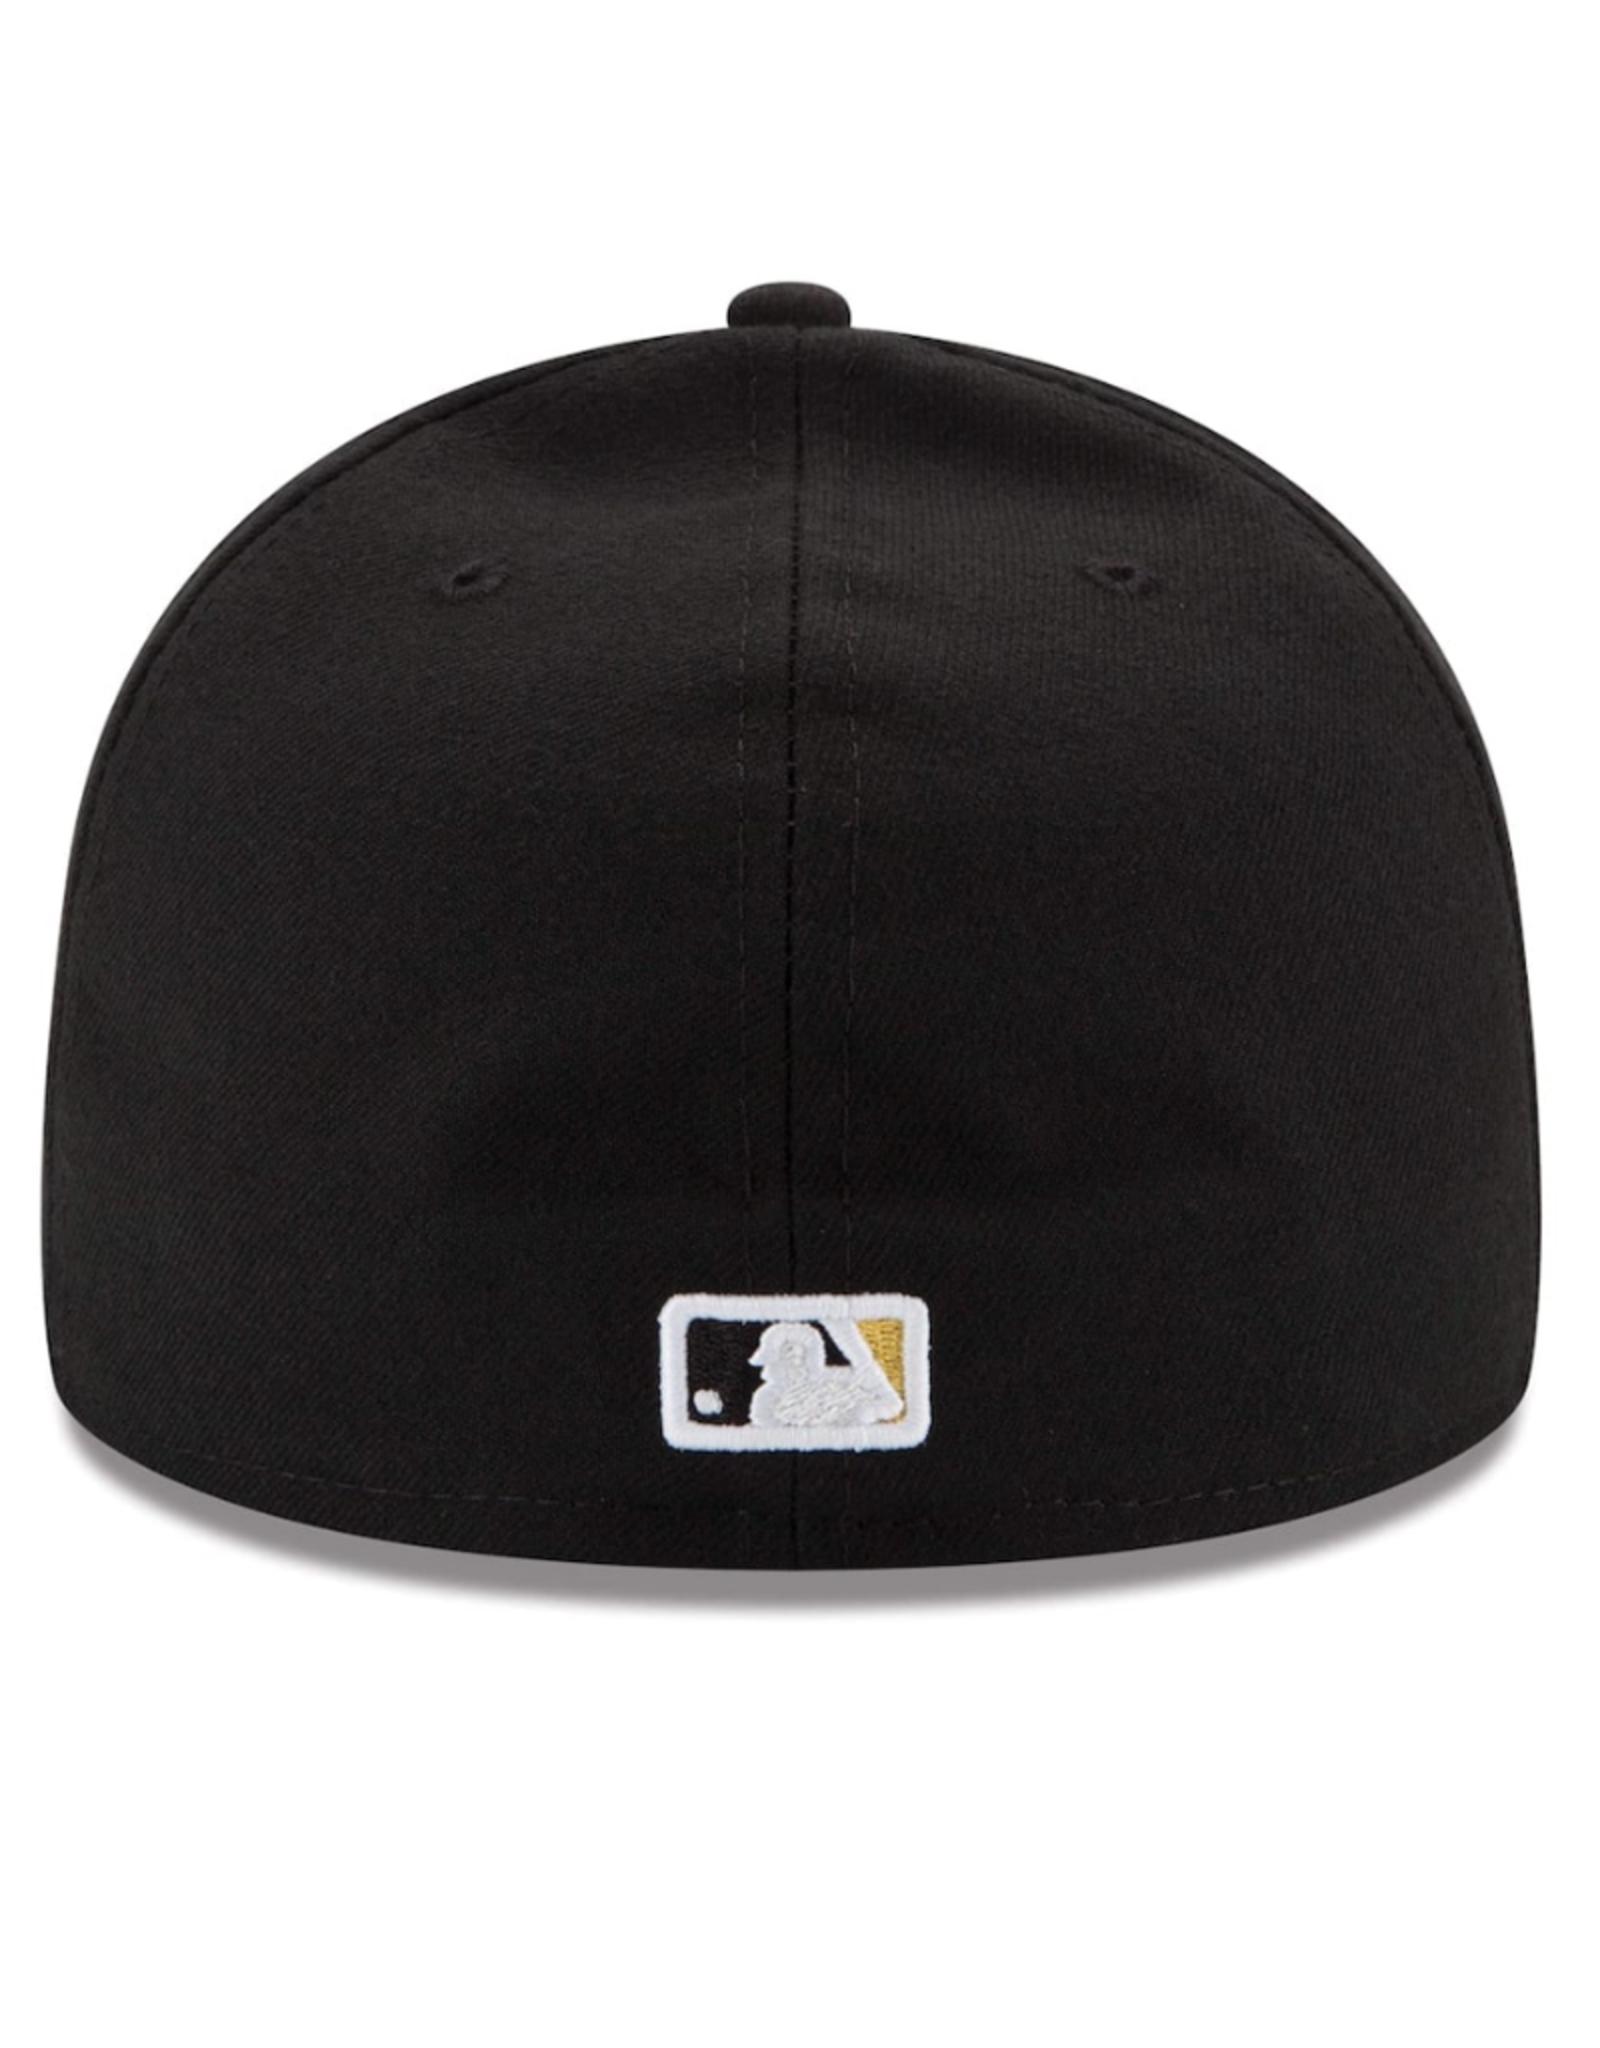 New Era On-Field Alternate Hat Pittsburgh Pirates Black